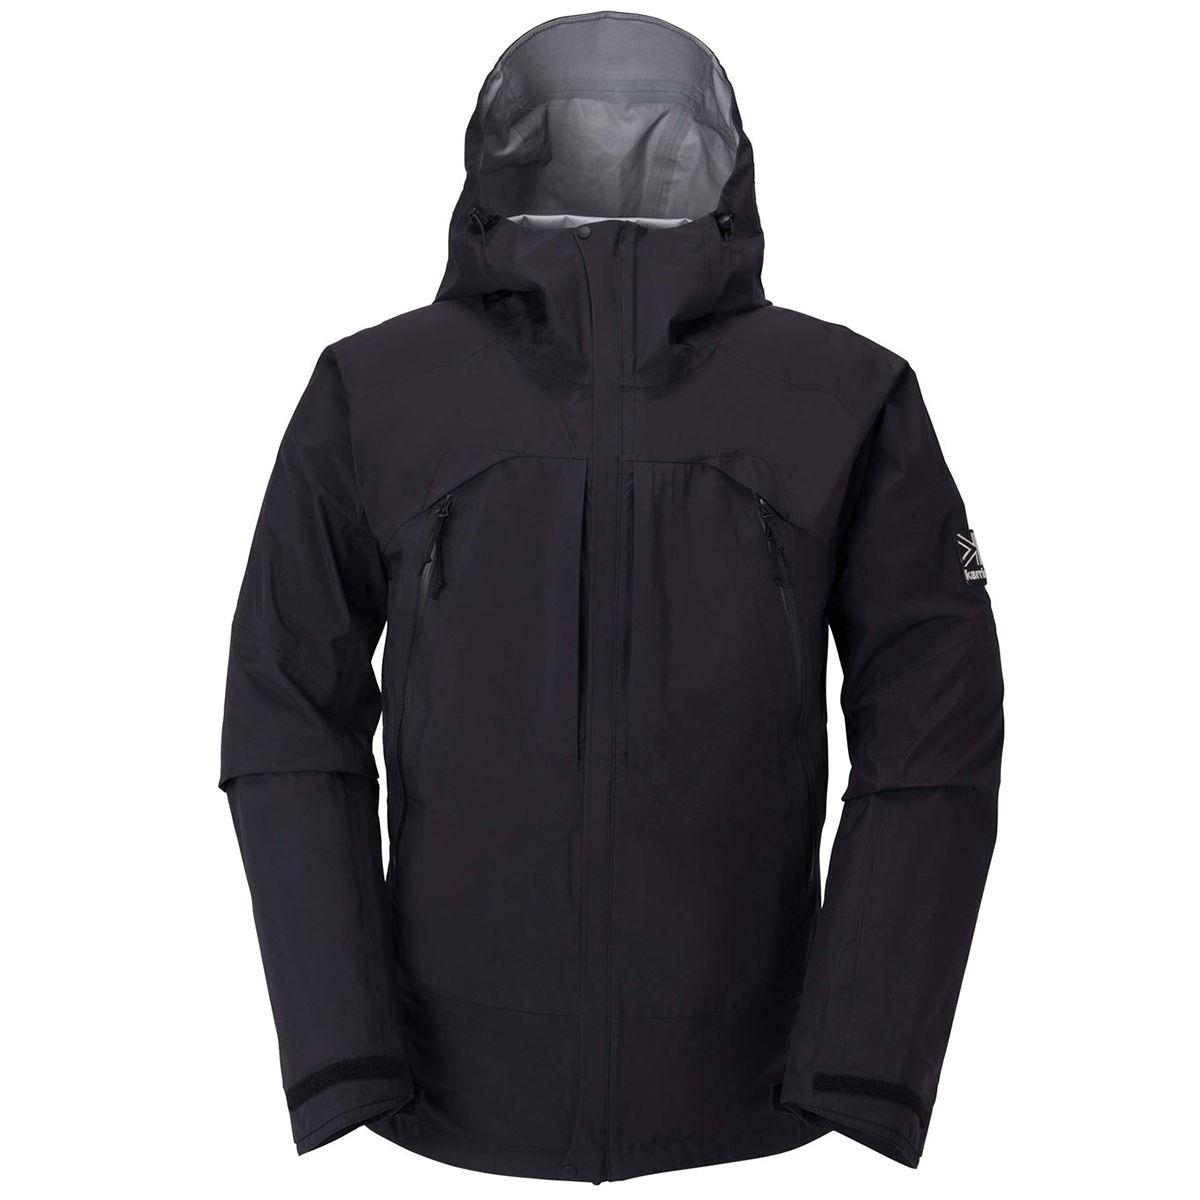 Karrimor Men's Summitpro Jacket - Black, L